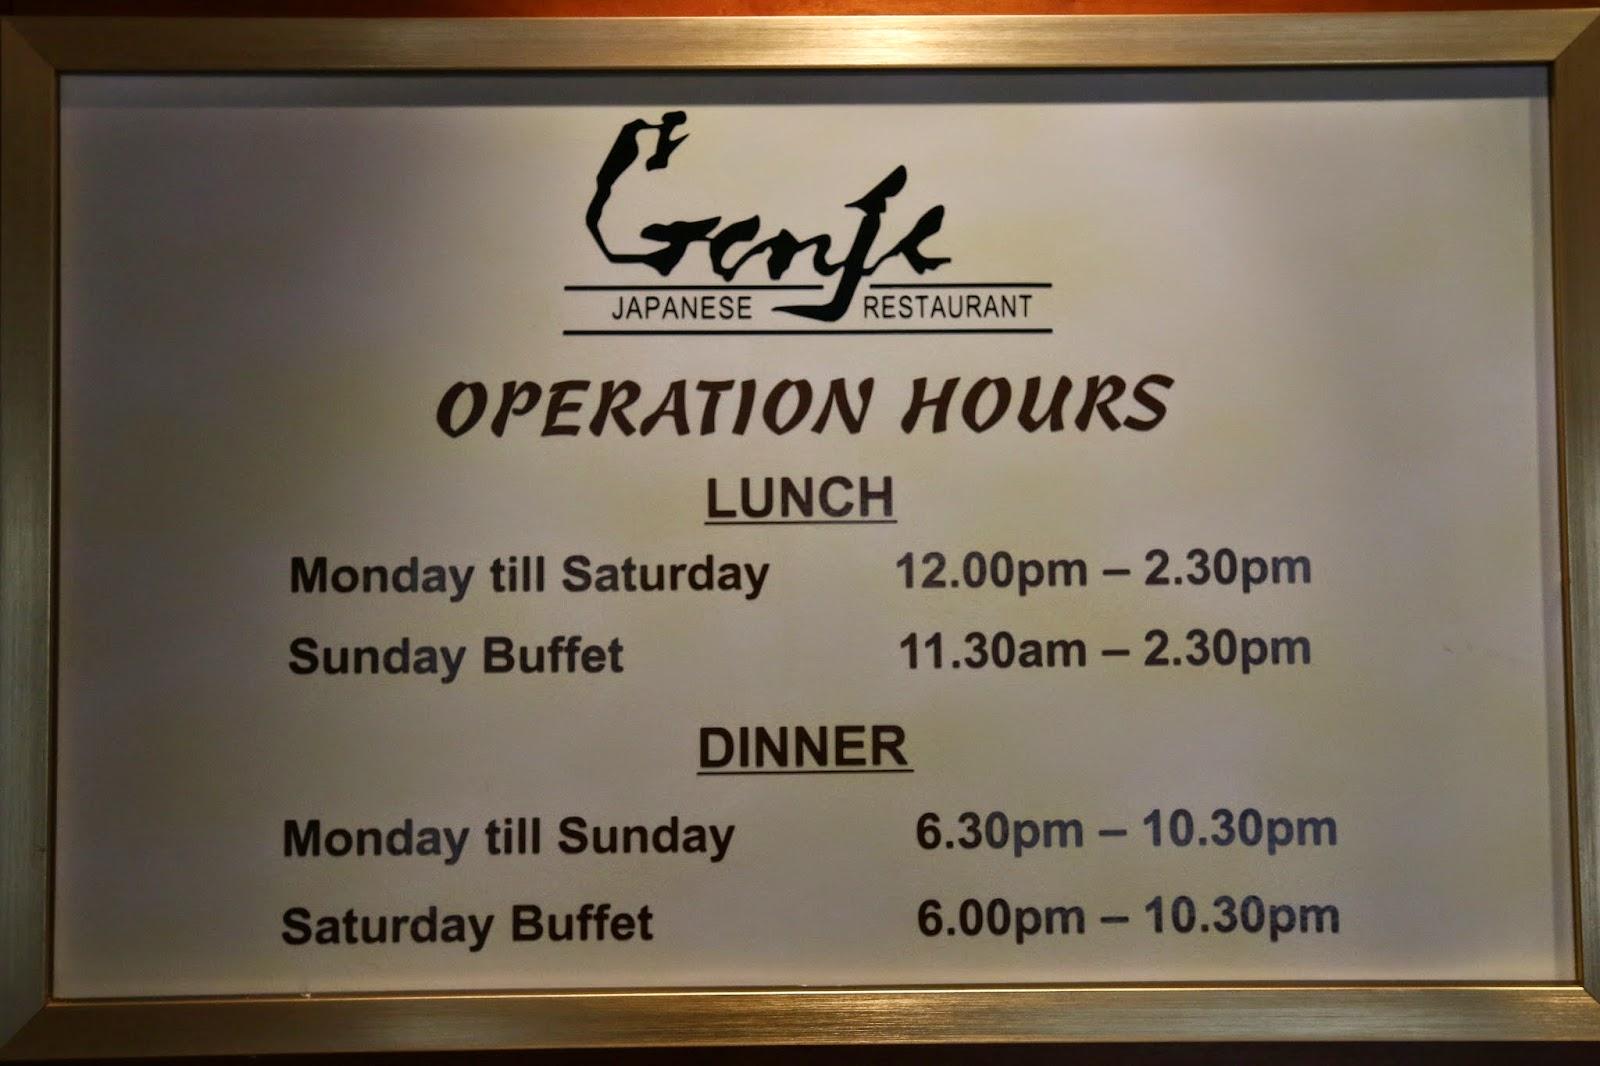 genji japanese restaurant pj hilton rh chillout soulout freakout blogspot com hilton buffet price kuwait hilton buffet price kuching